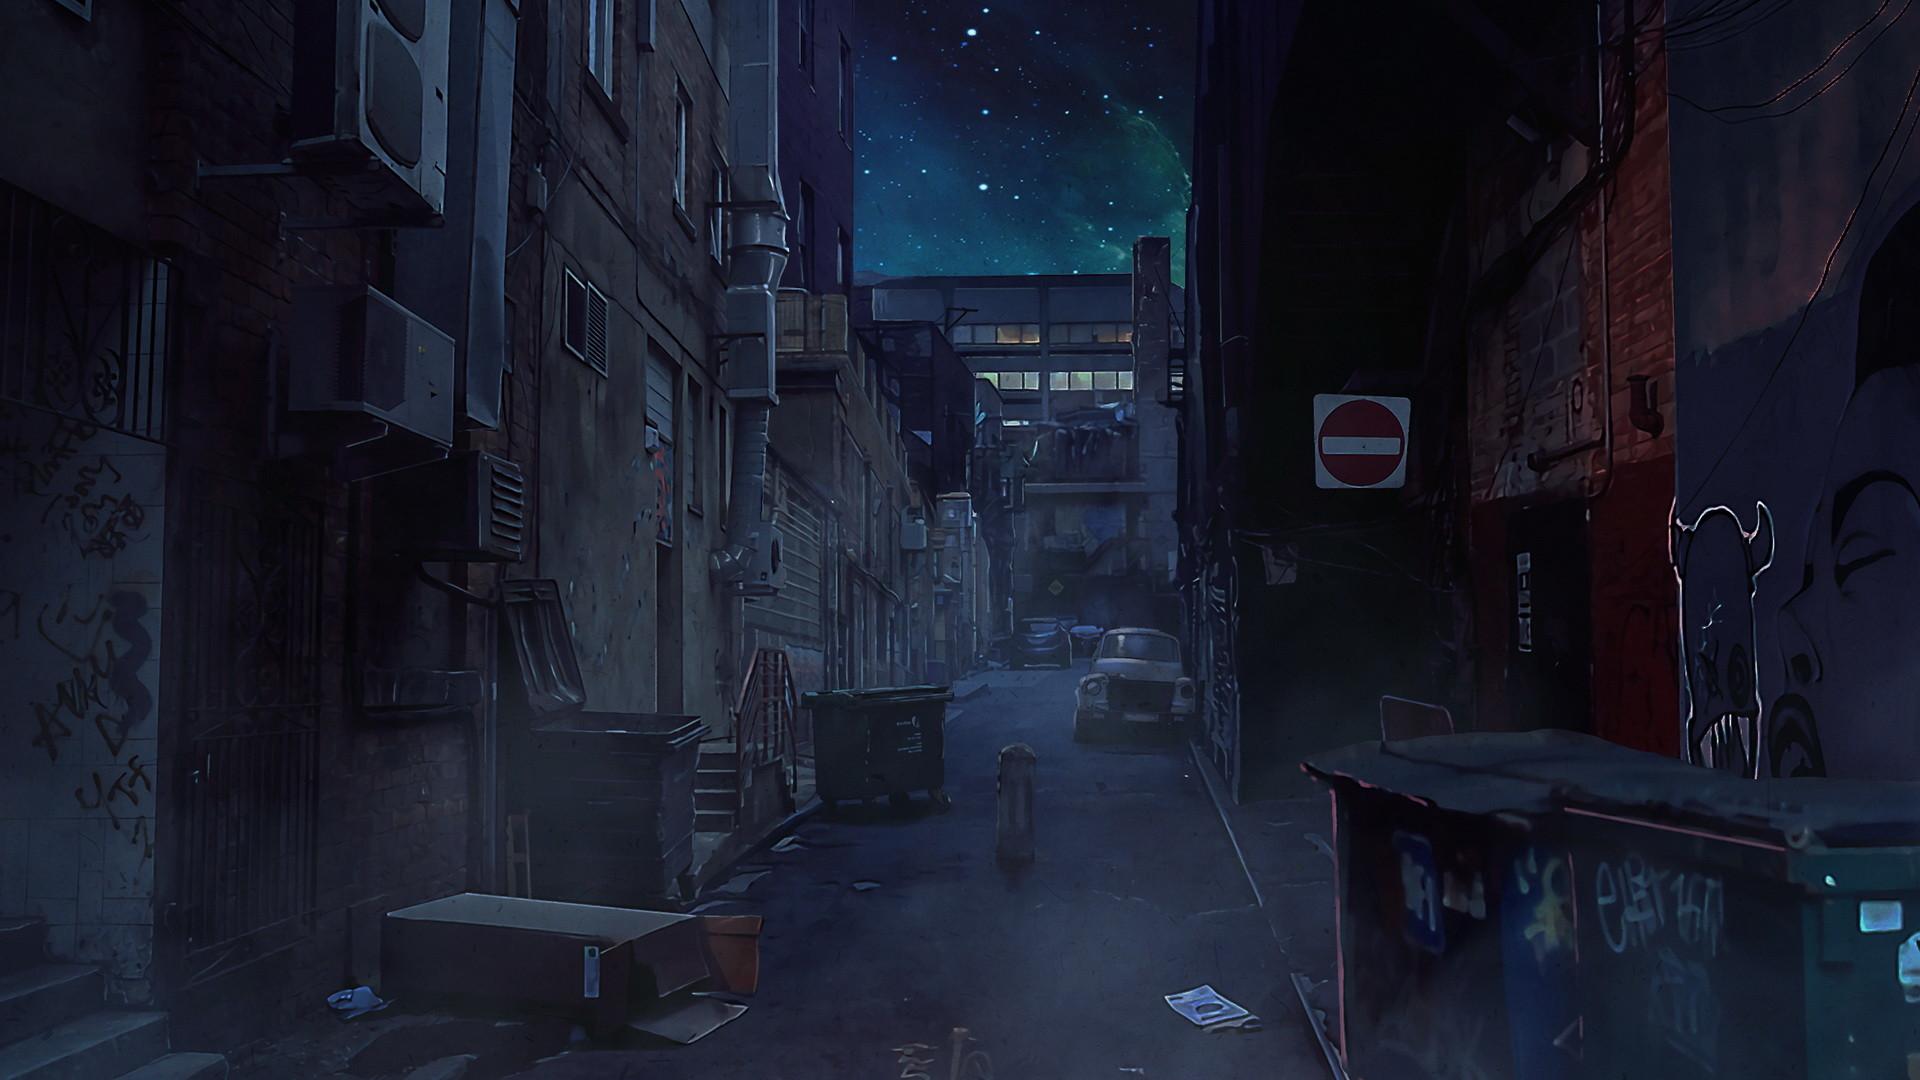 Scene 1 - Street view